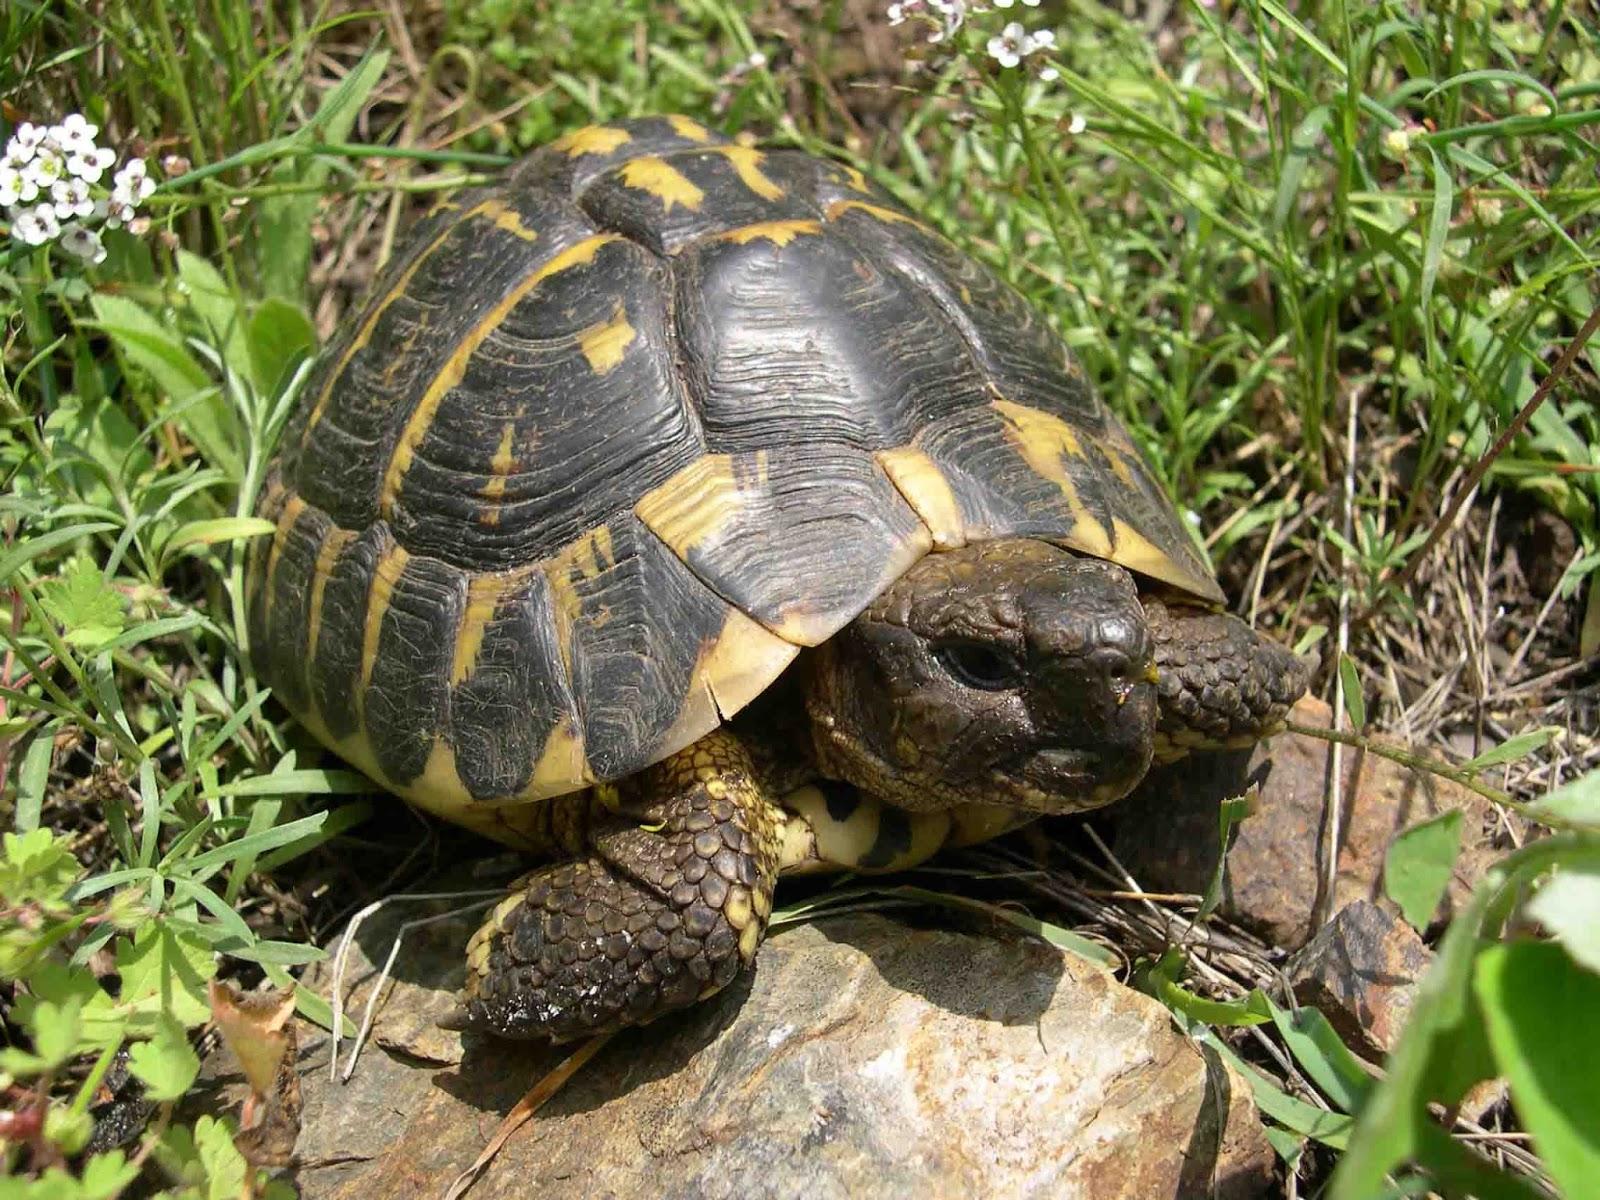 Amici di chicca microchip obbligatorio per le tartarughe for Riscaldatore per tartarughe